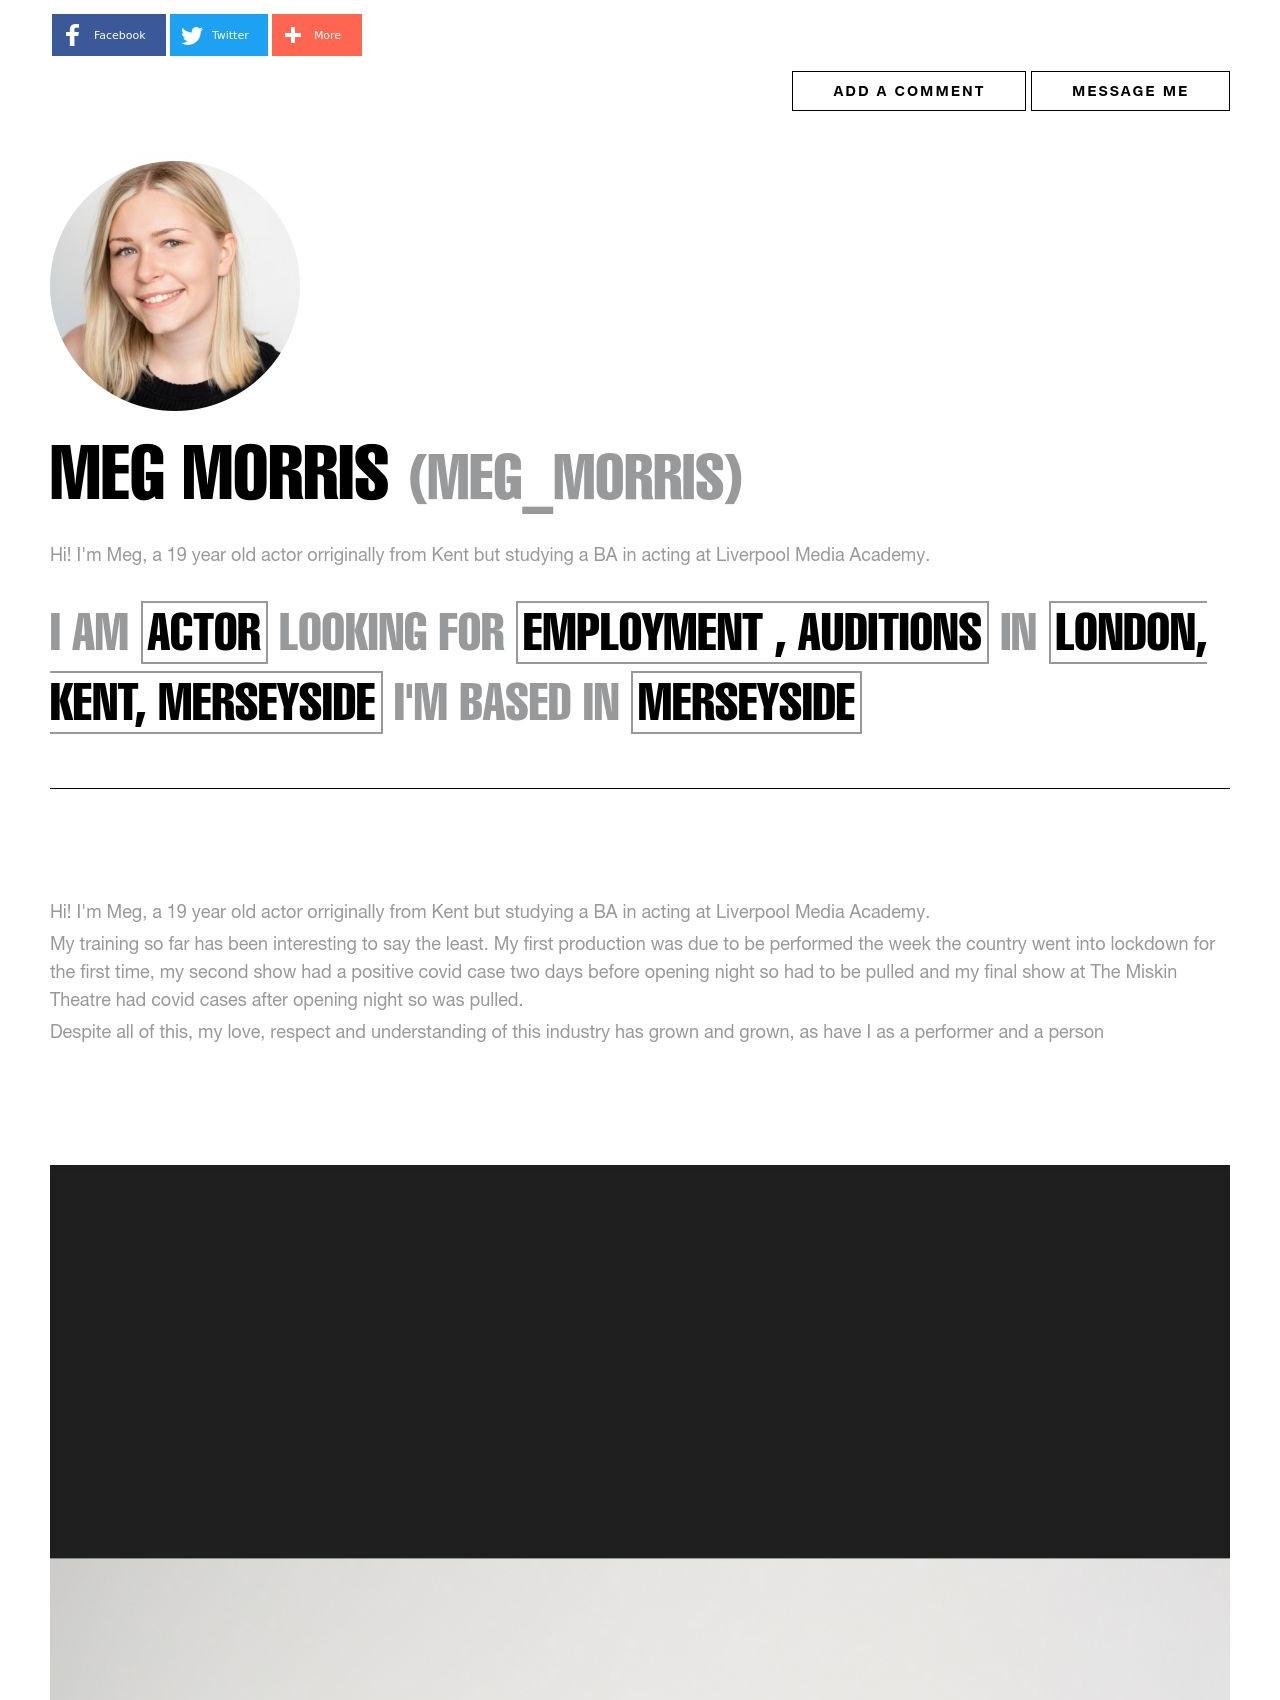 Meg Morris